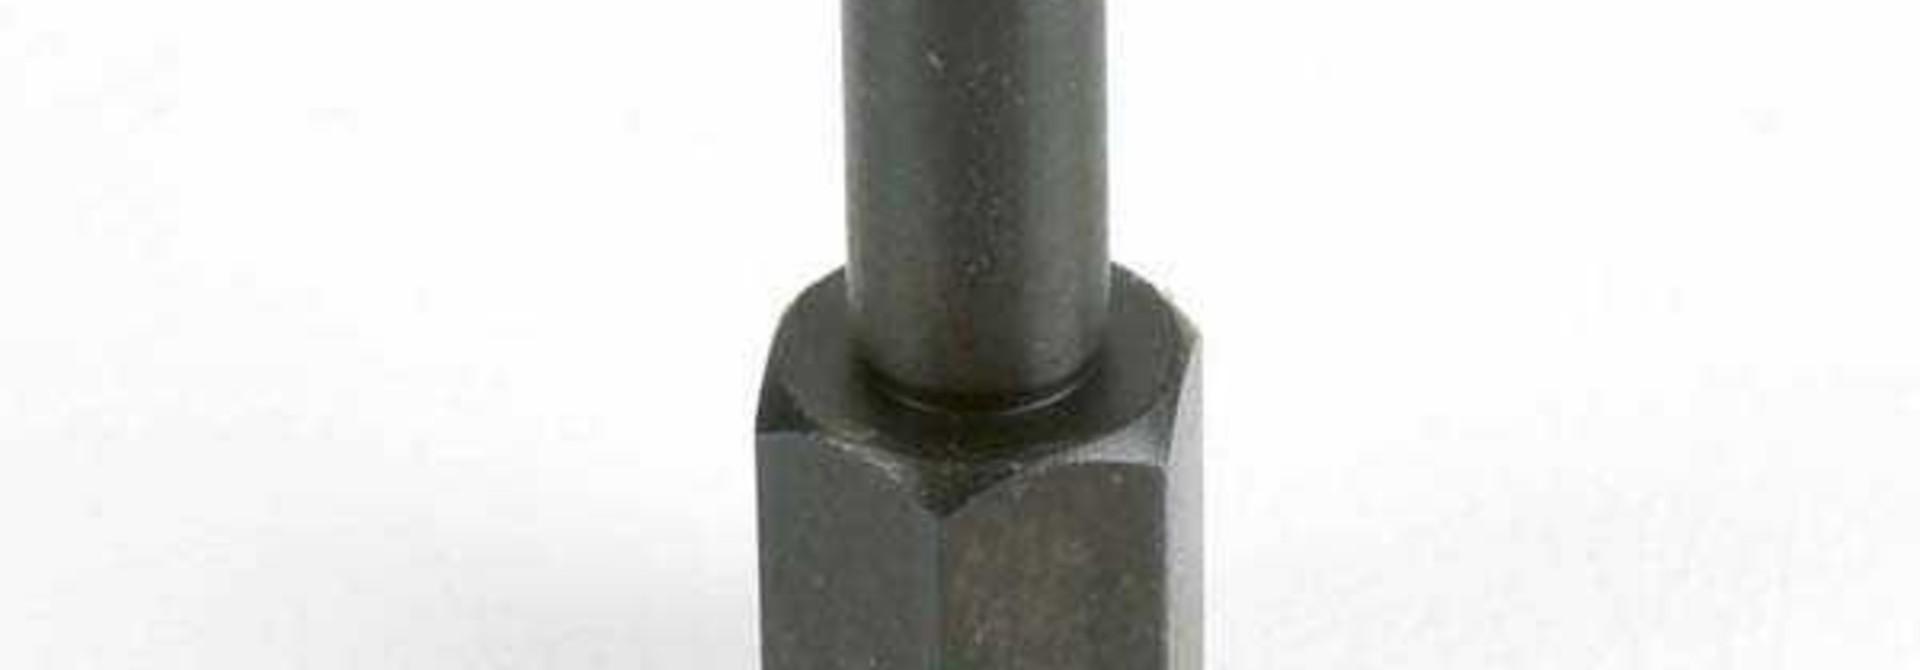 Adapter nut, clutch, TRX3283